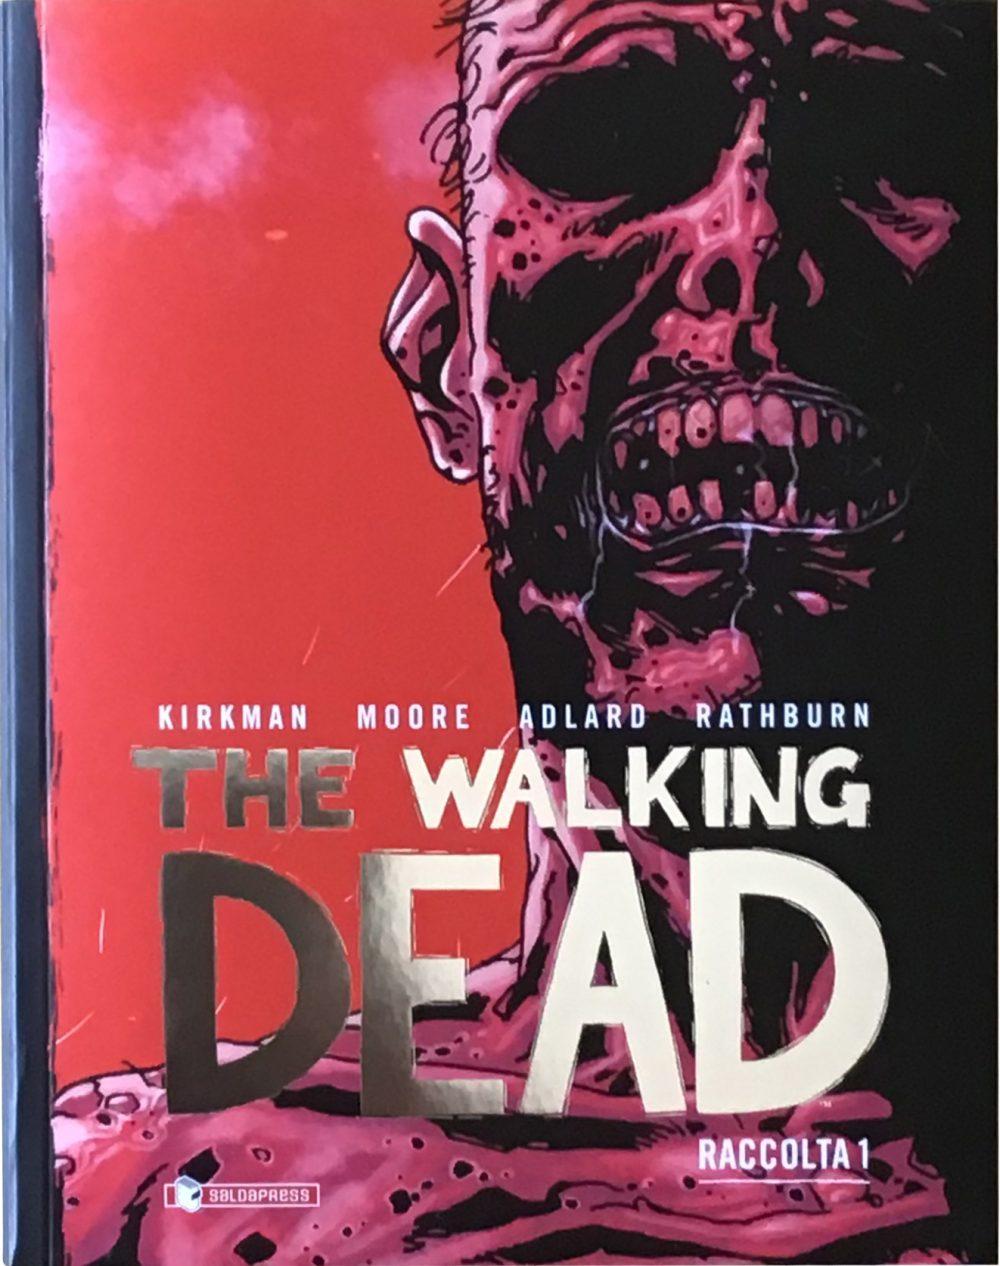 The Walking Dead Raccolta vol. 1, copertina di Charlie Adlard